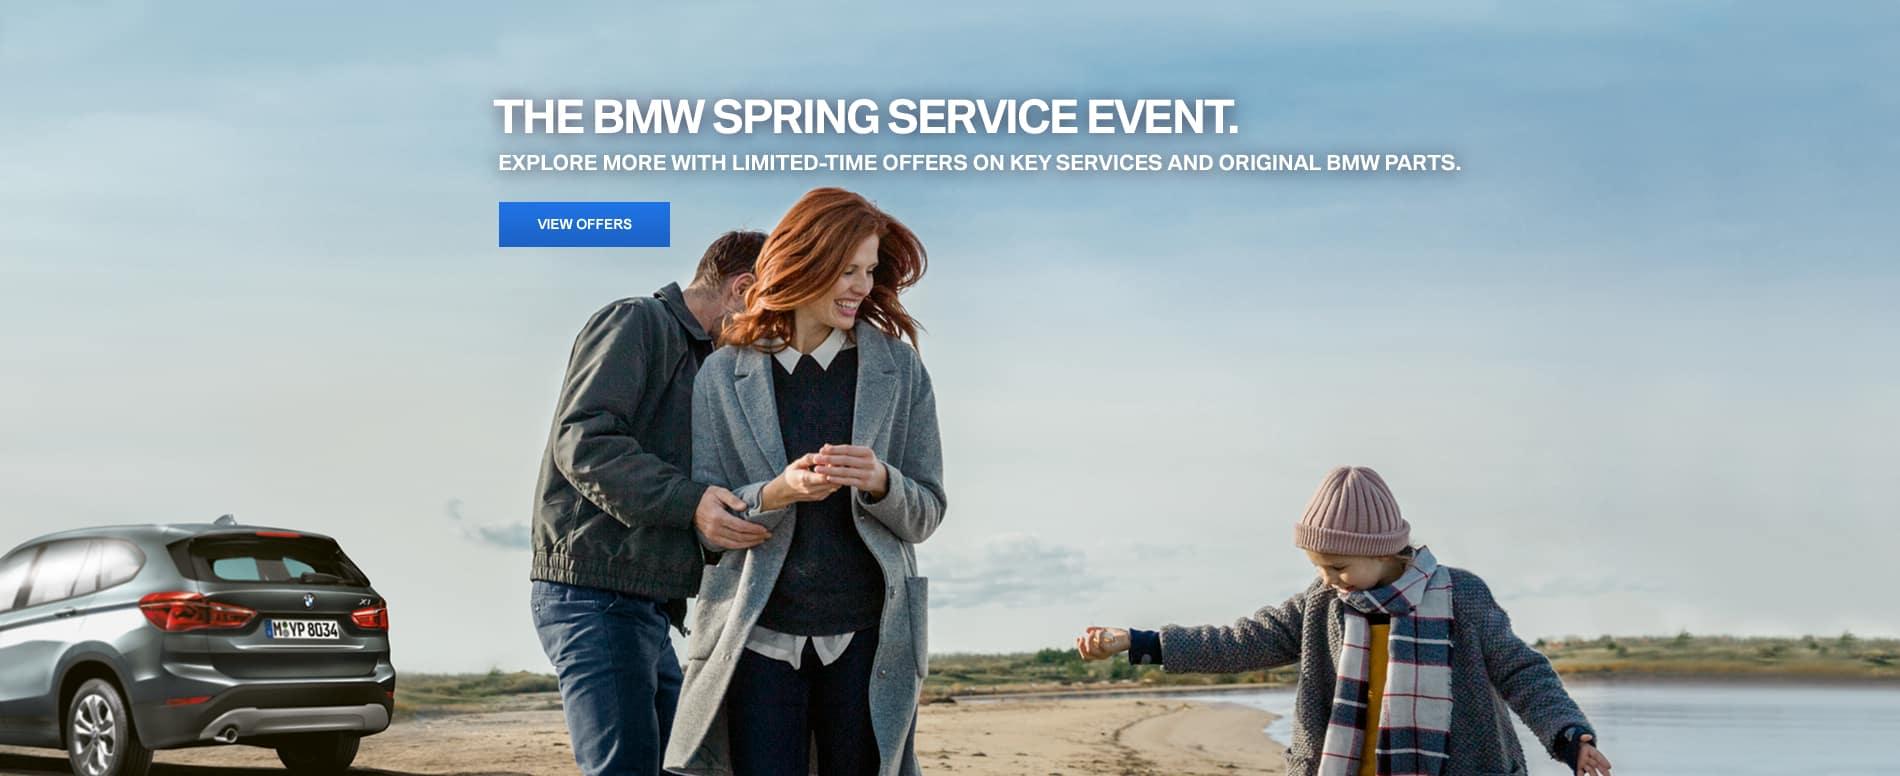 BMW Spring Service Event